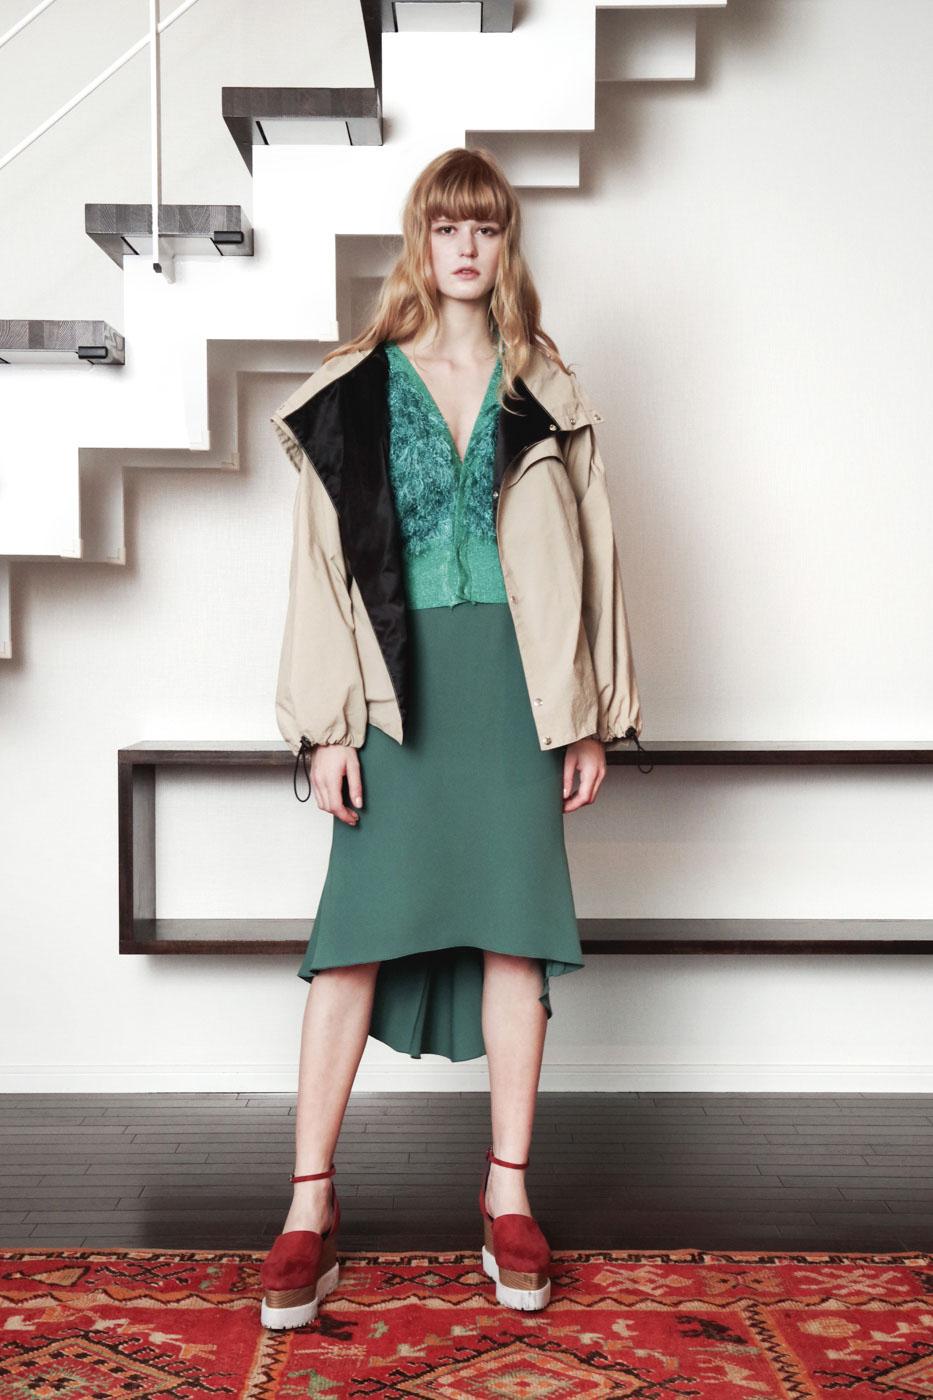 19017 Blouson ¥40,000, 19033 Cardigan ¥24,000, 19024 Skirt ¥23,000